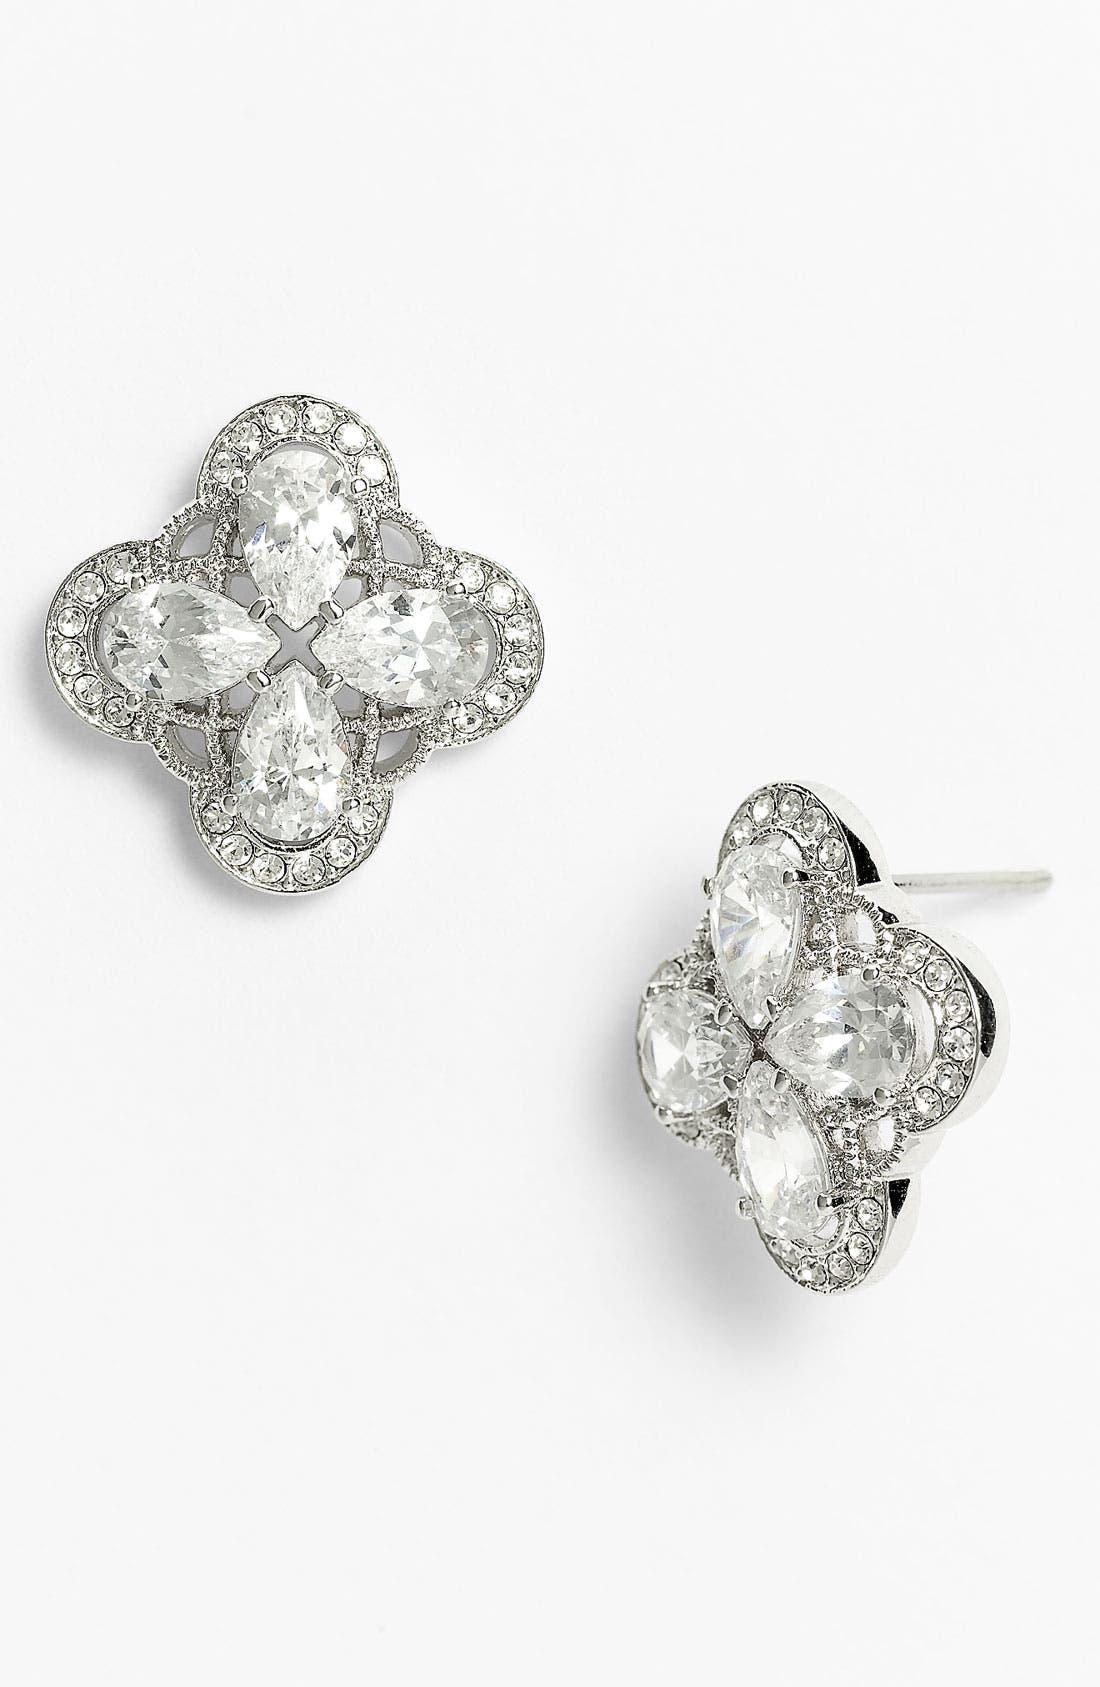 Alternate Image 1 Selected - Nadri 'Ariel' Button Stud Earrings (Nordstrom Exclusive)